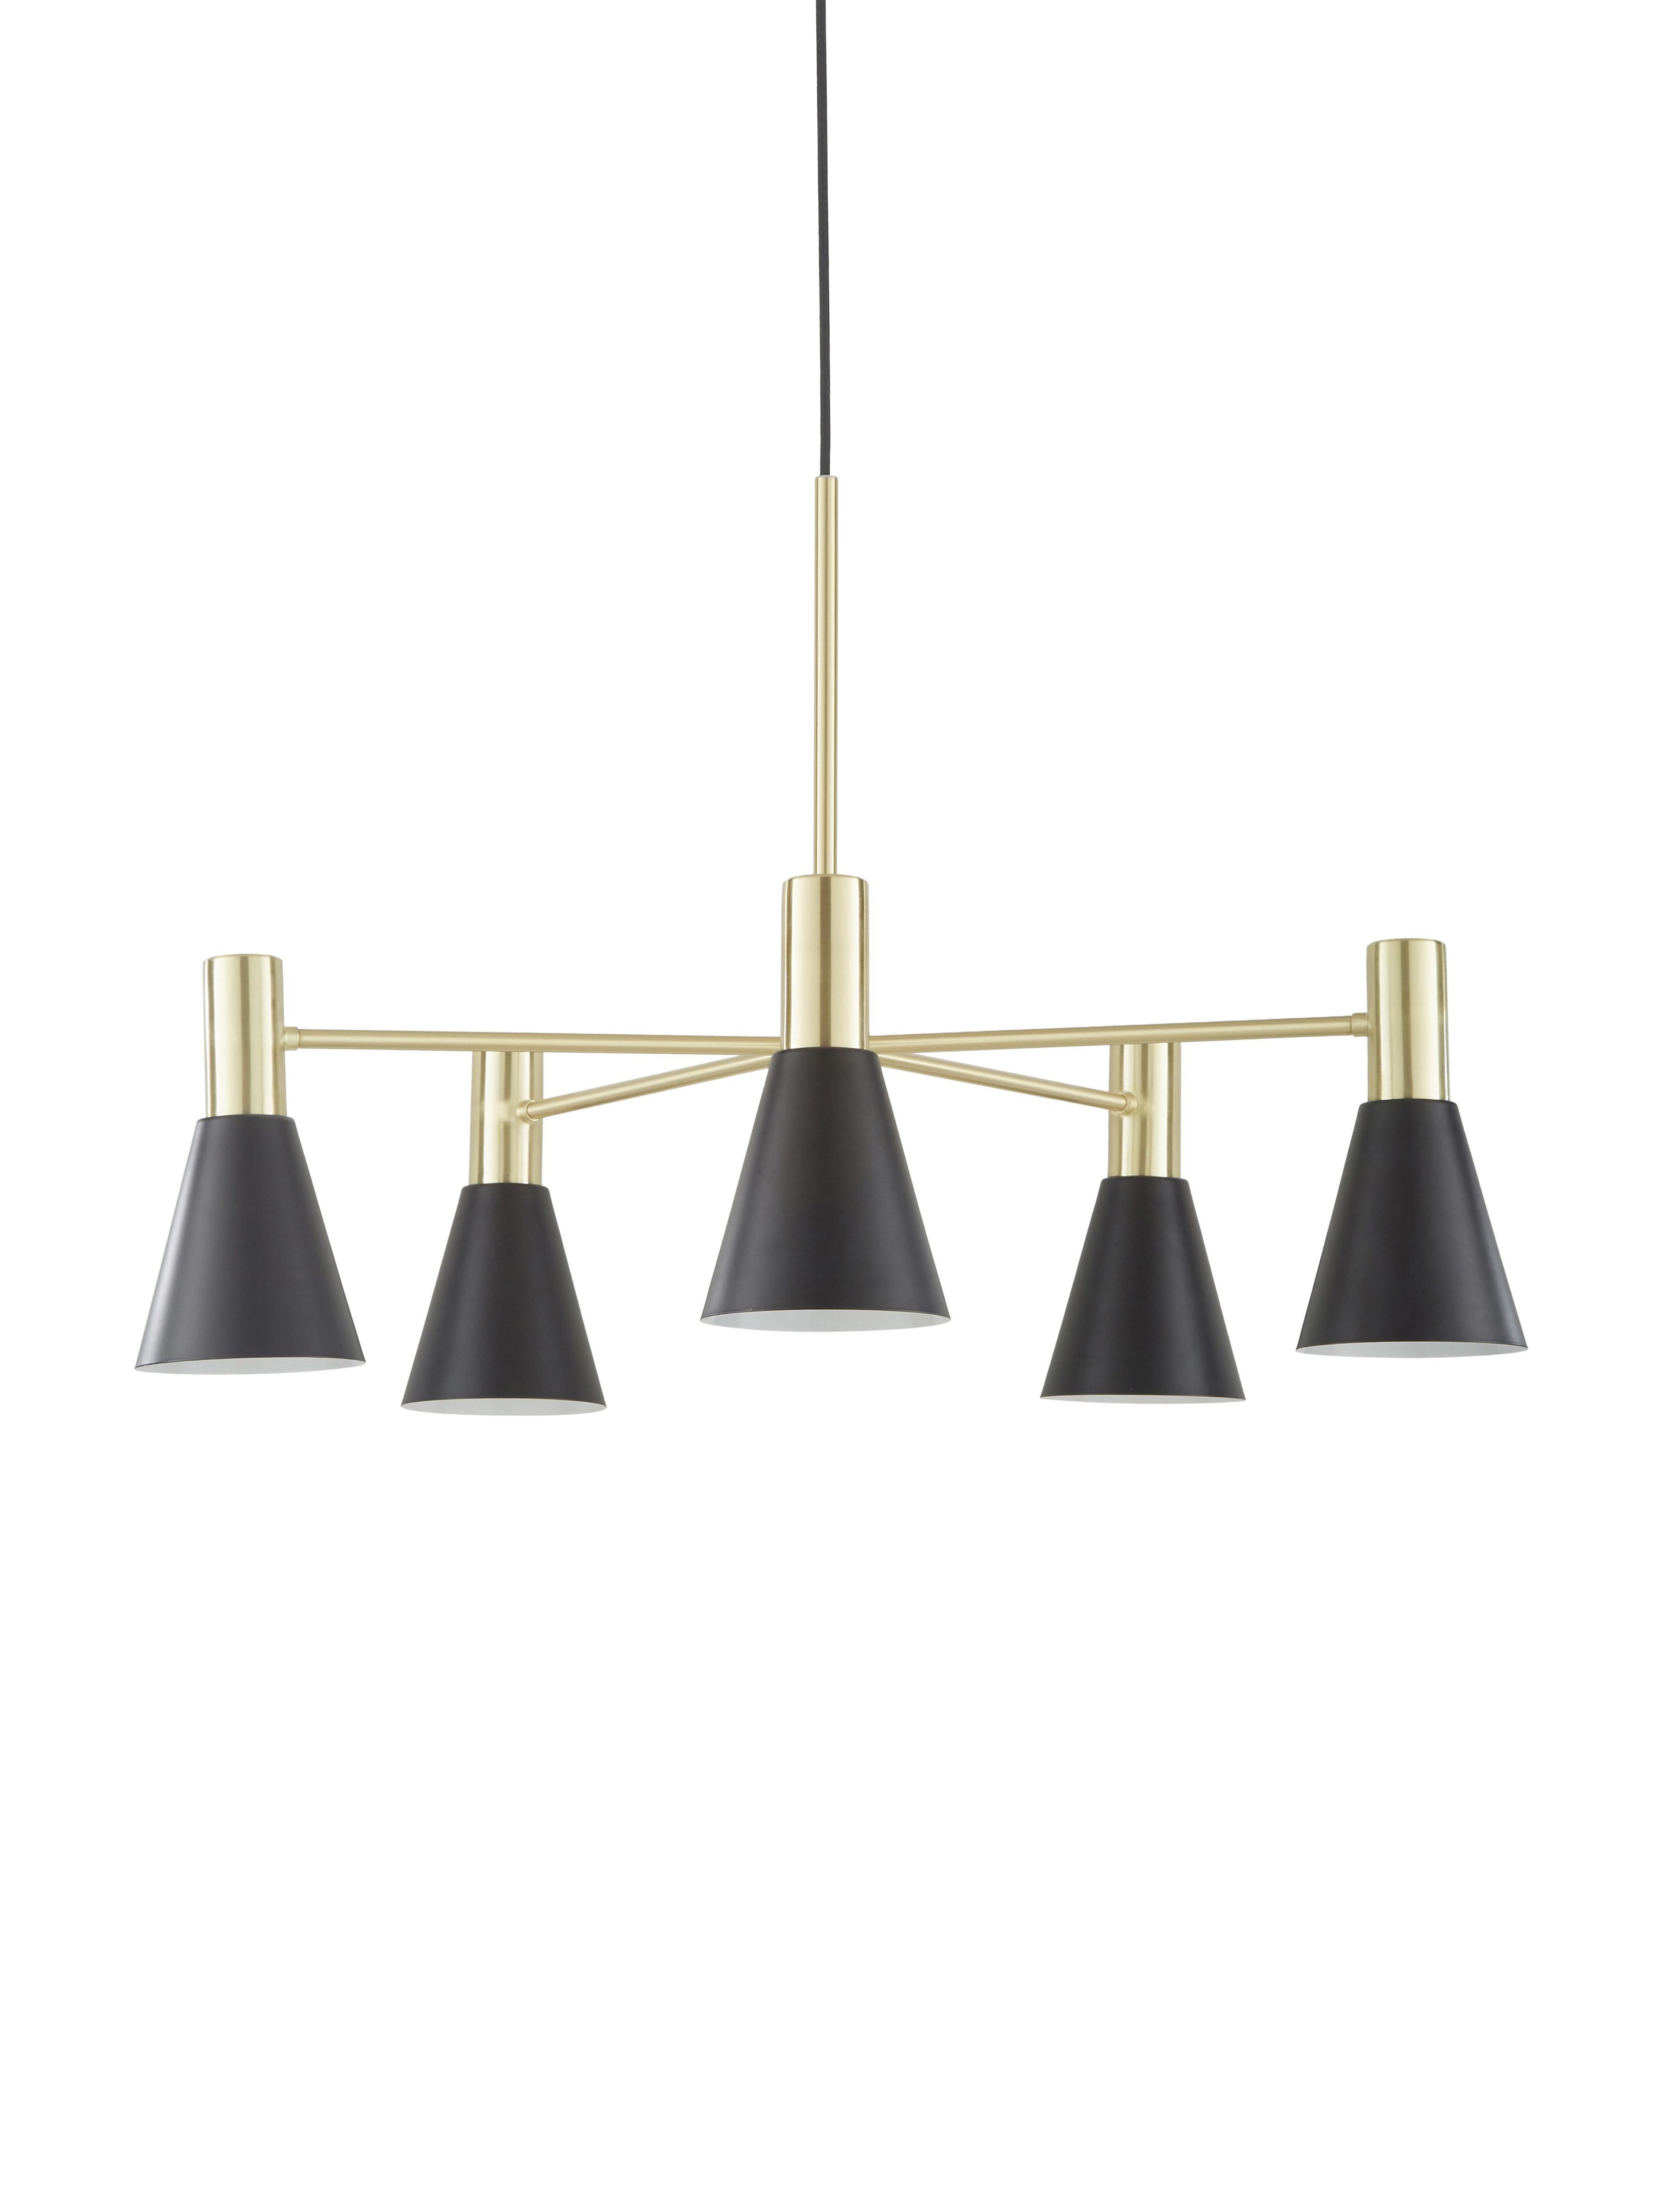 Hanglamp Sia, Lampenkappen: mat zwart. Baldakijn en lampframe: geborsteld messingkleurig, Ø 75 cm